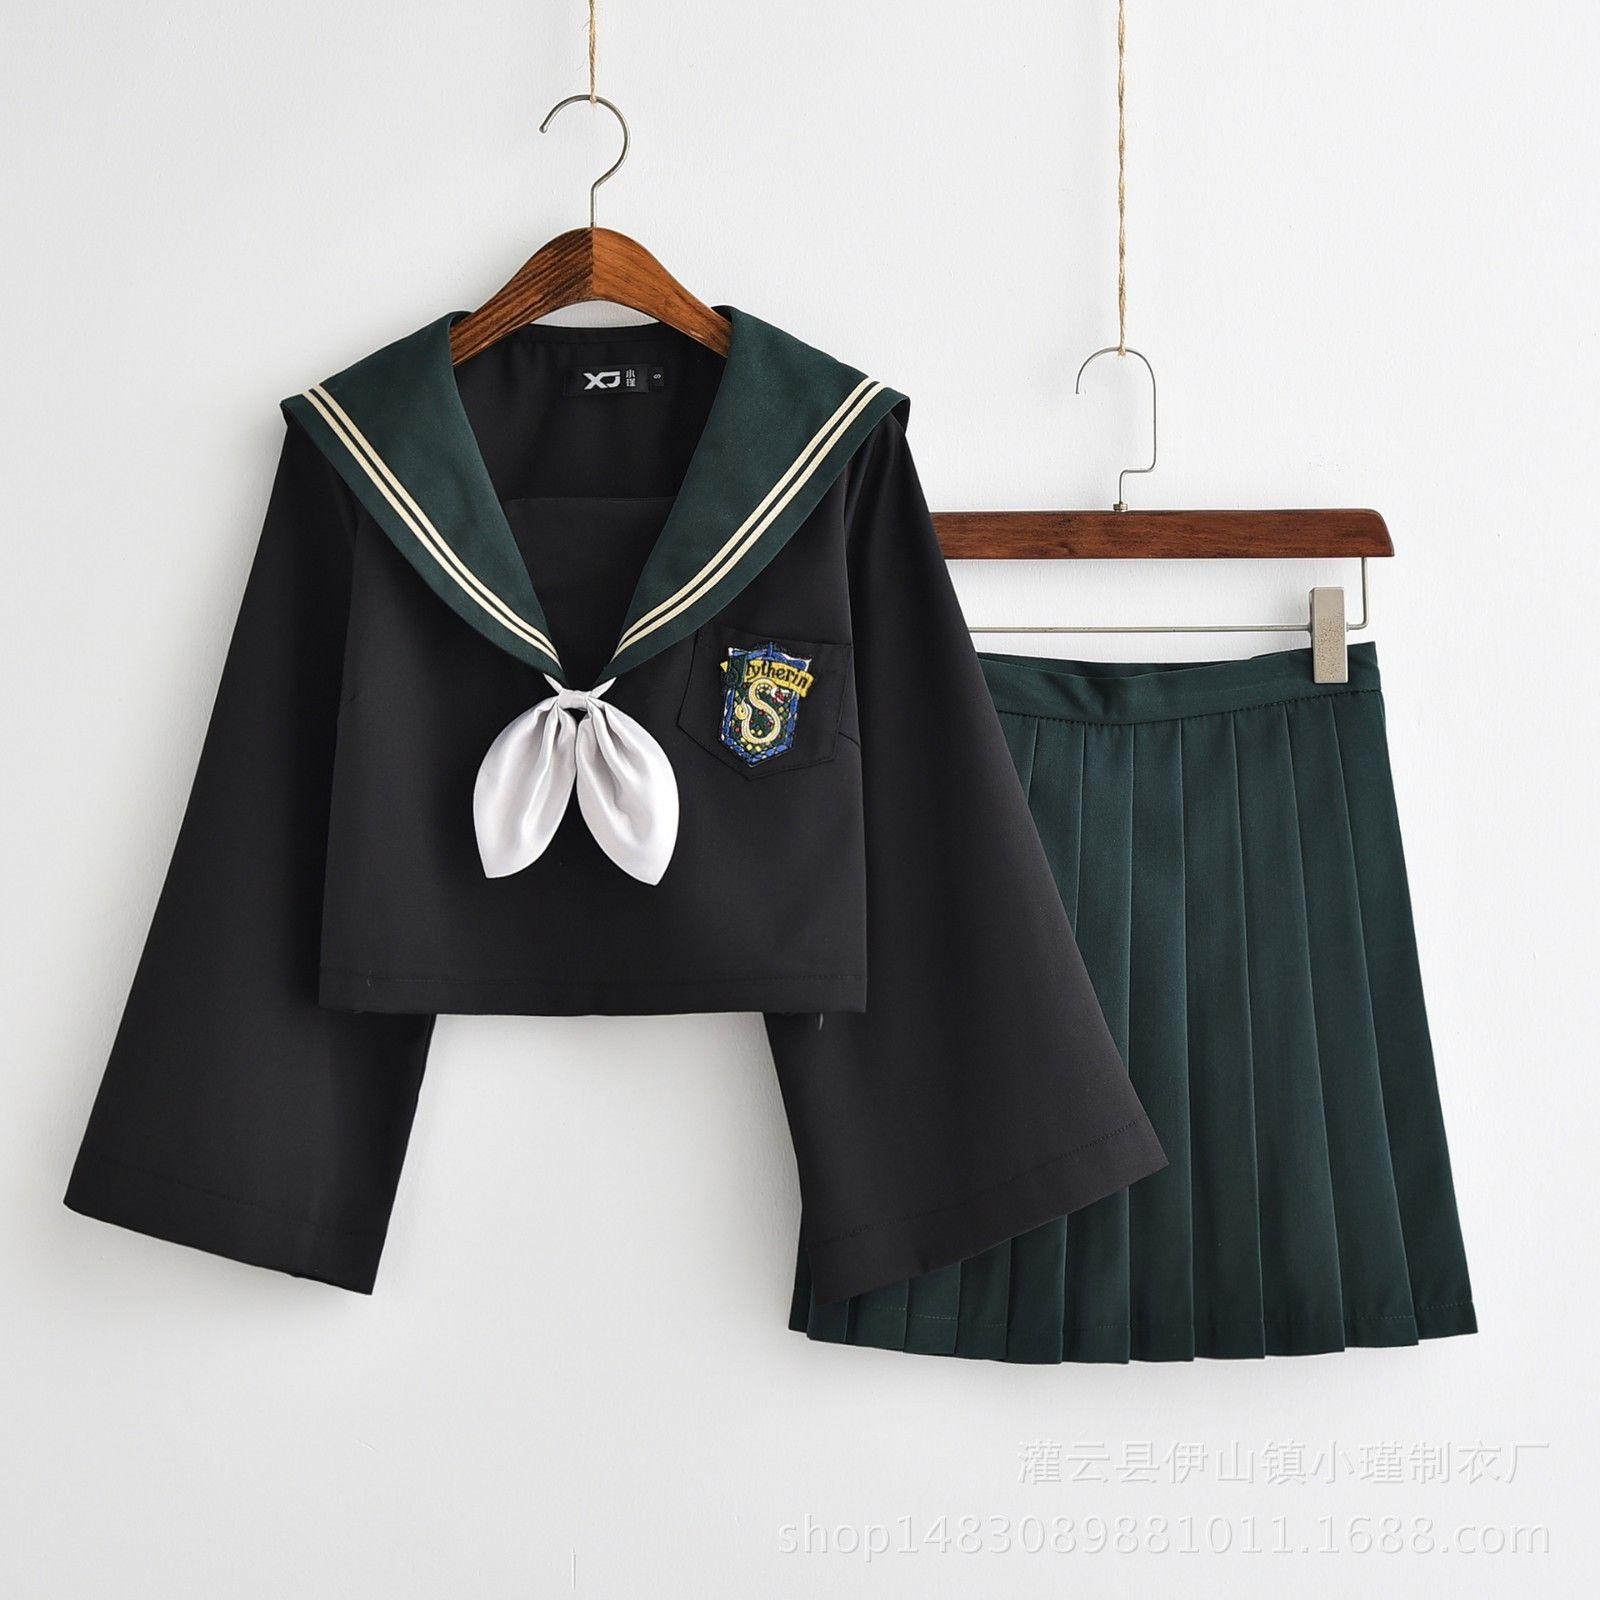 Harri Potter Slytherin Student School Uniform Sailor Suit JK Uniform Cosplay